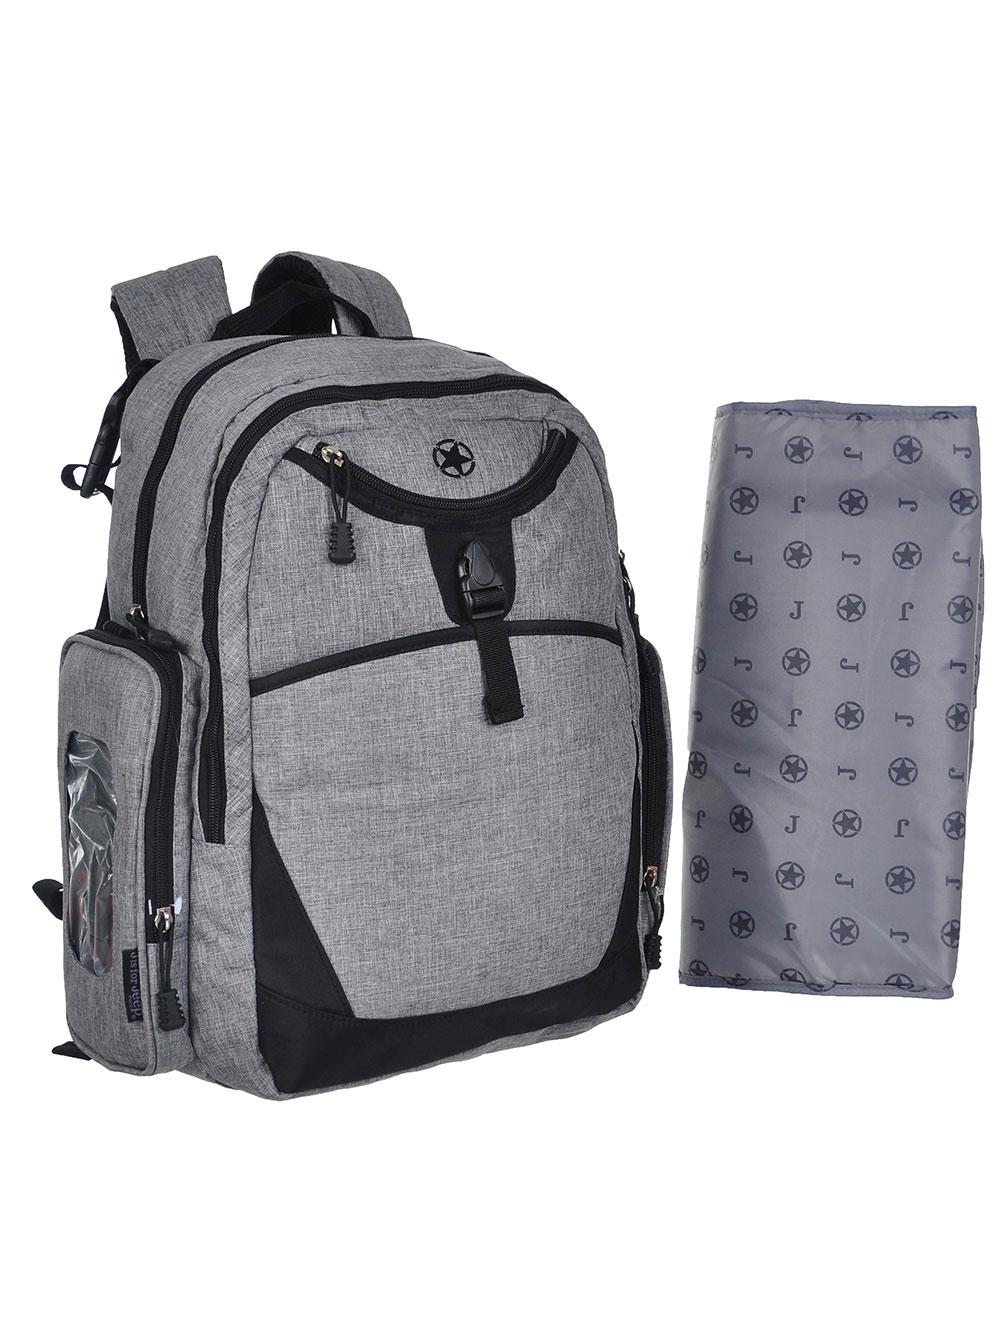 6b7c5190ca Jeep Backpack Diaper Bag